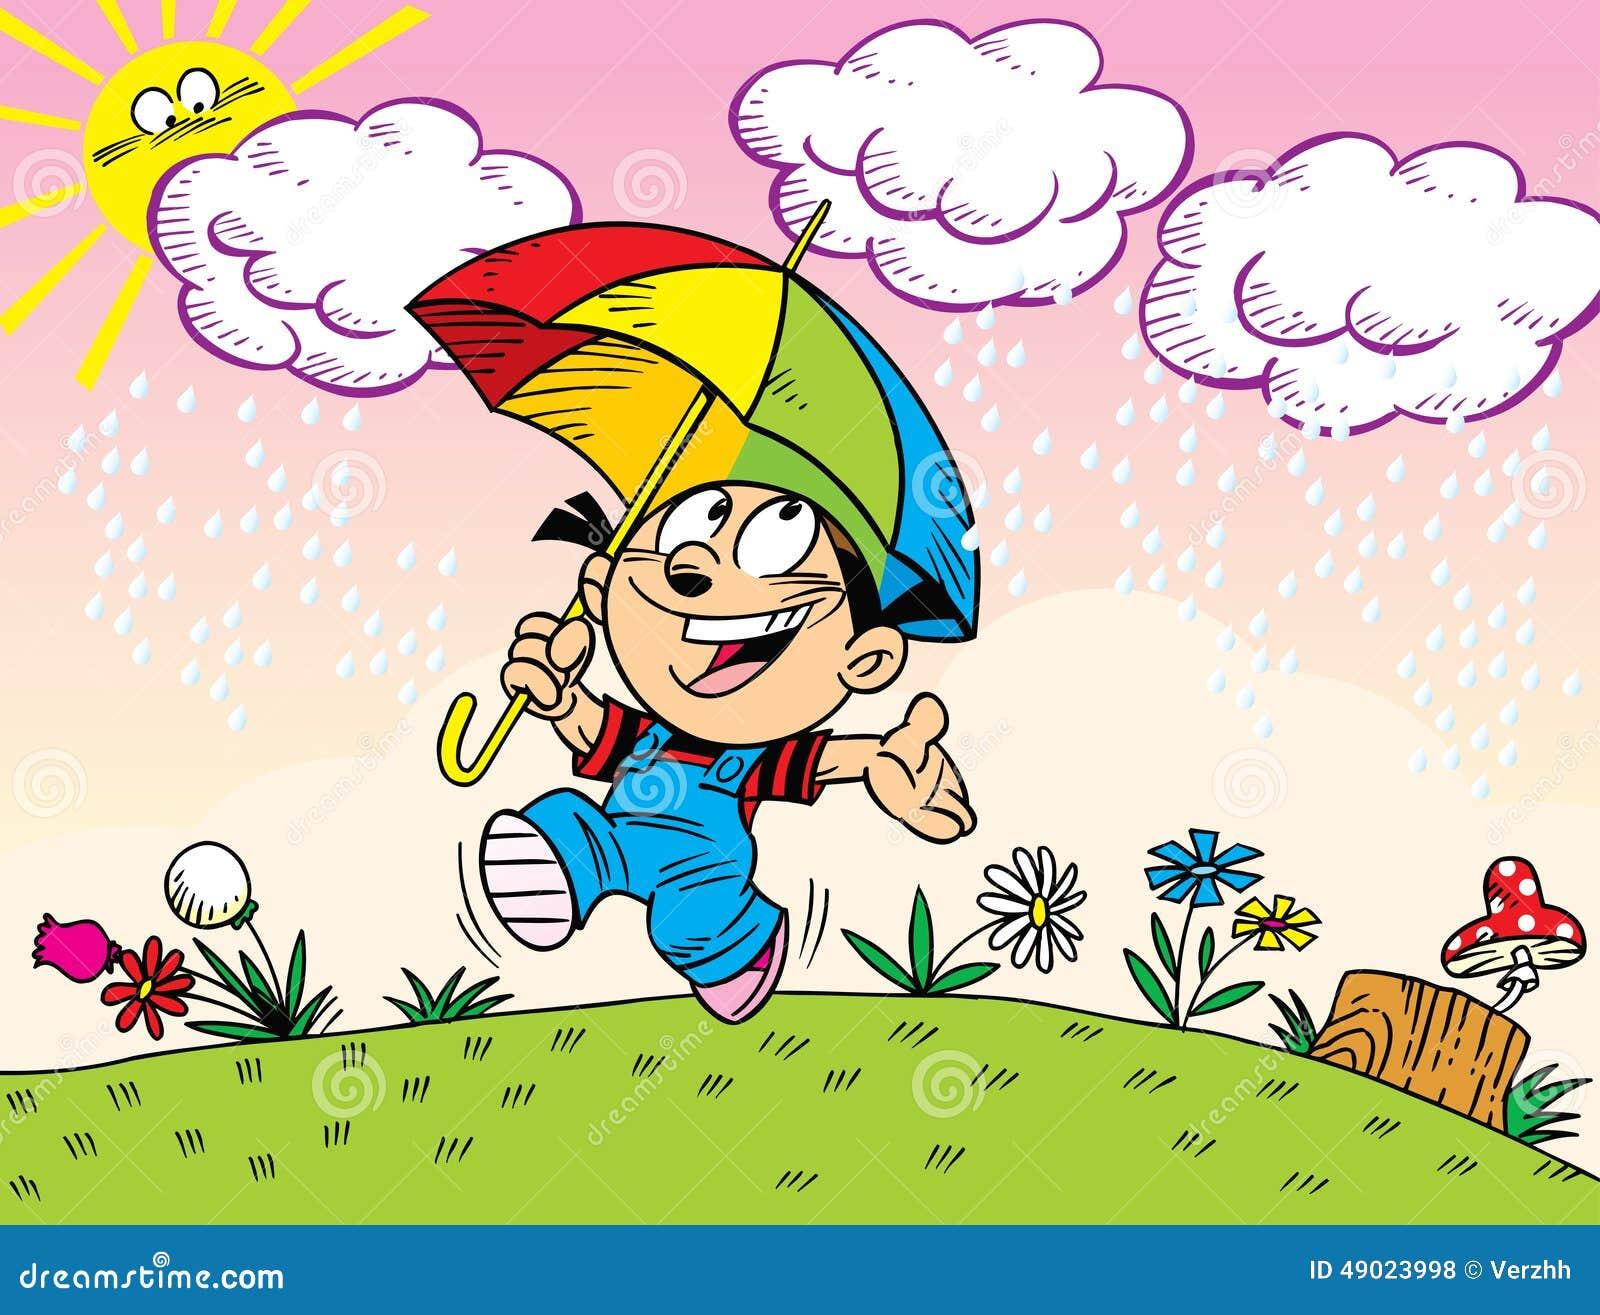 Clip Art Rainy Day Quotes: Walk Under The Umbrella Stock Vector. Illustration Of